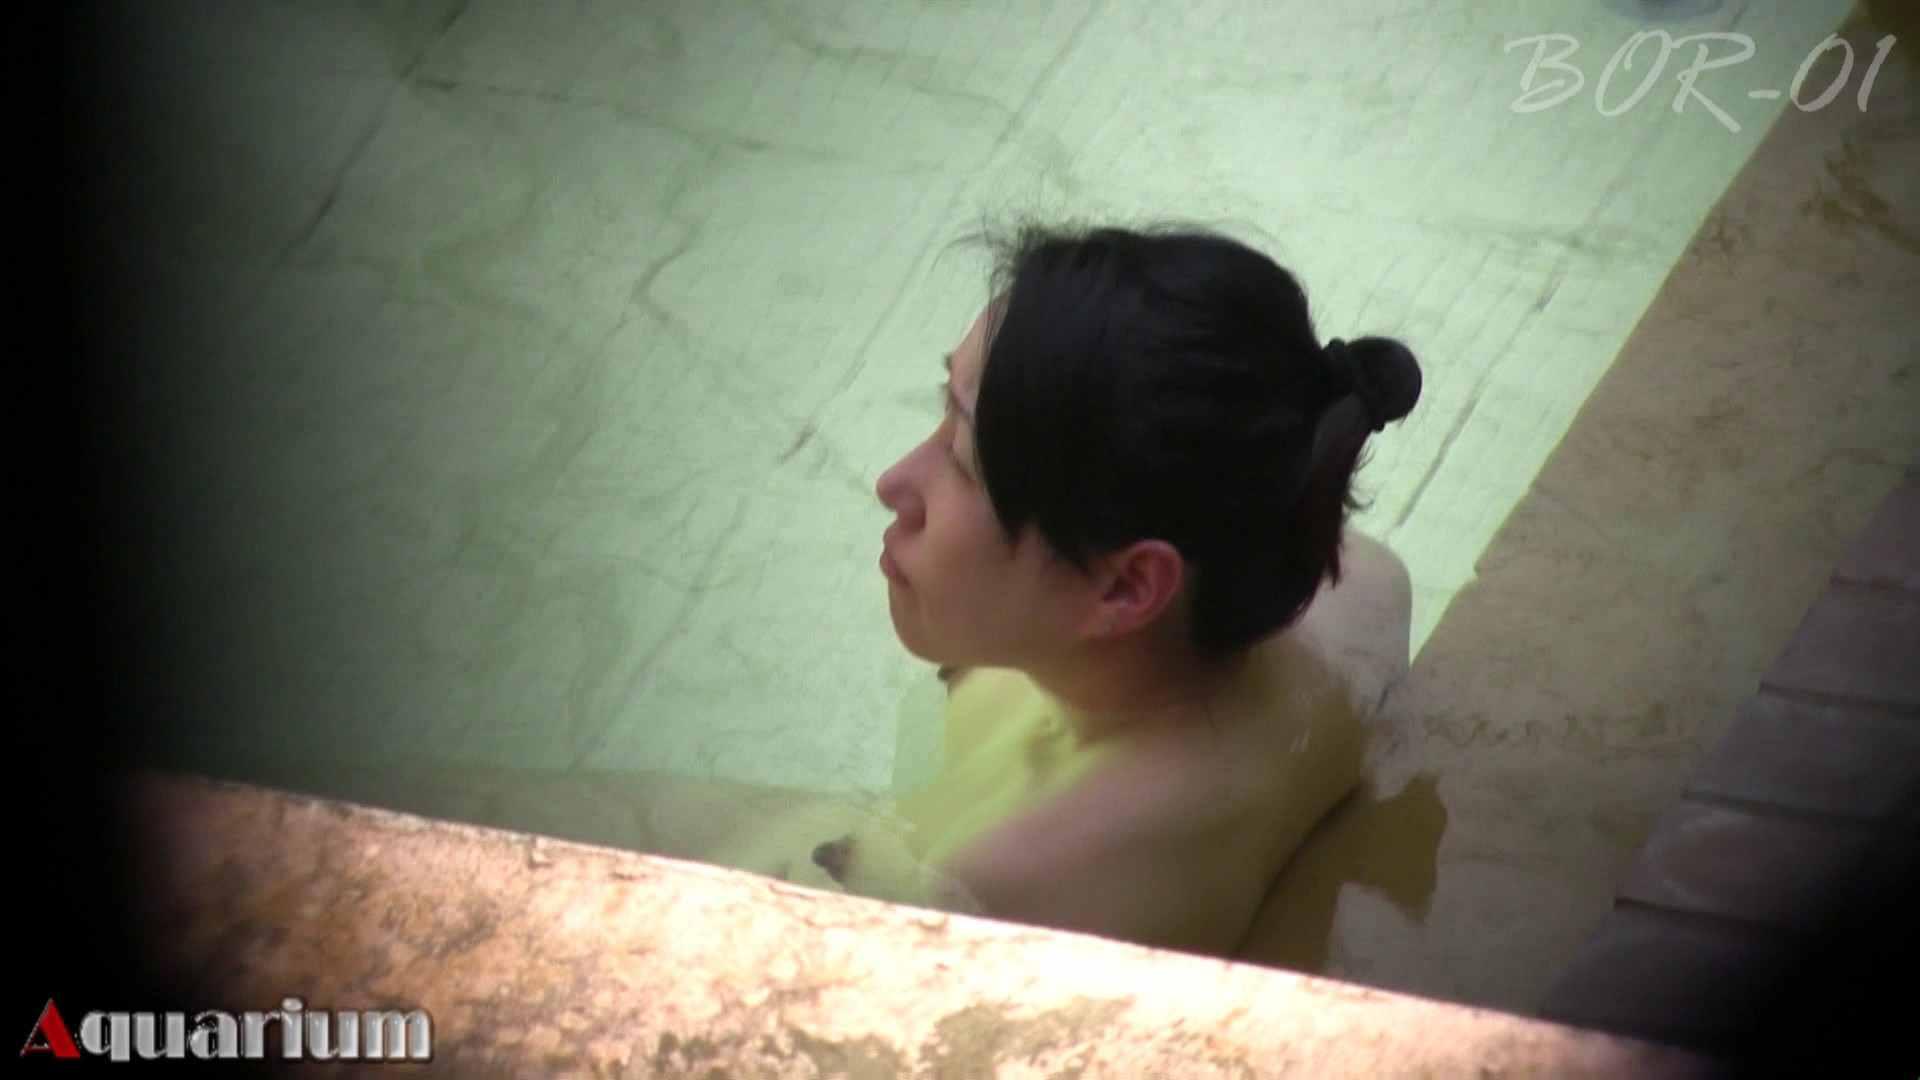 Aquaな露天風呂Vol.461 露天風呂 | OLのエロ生活  64連発 28